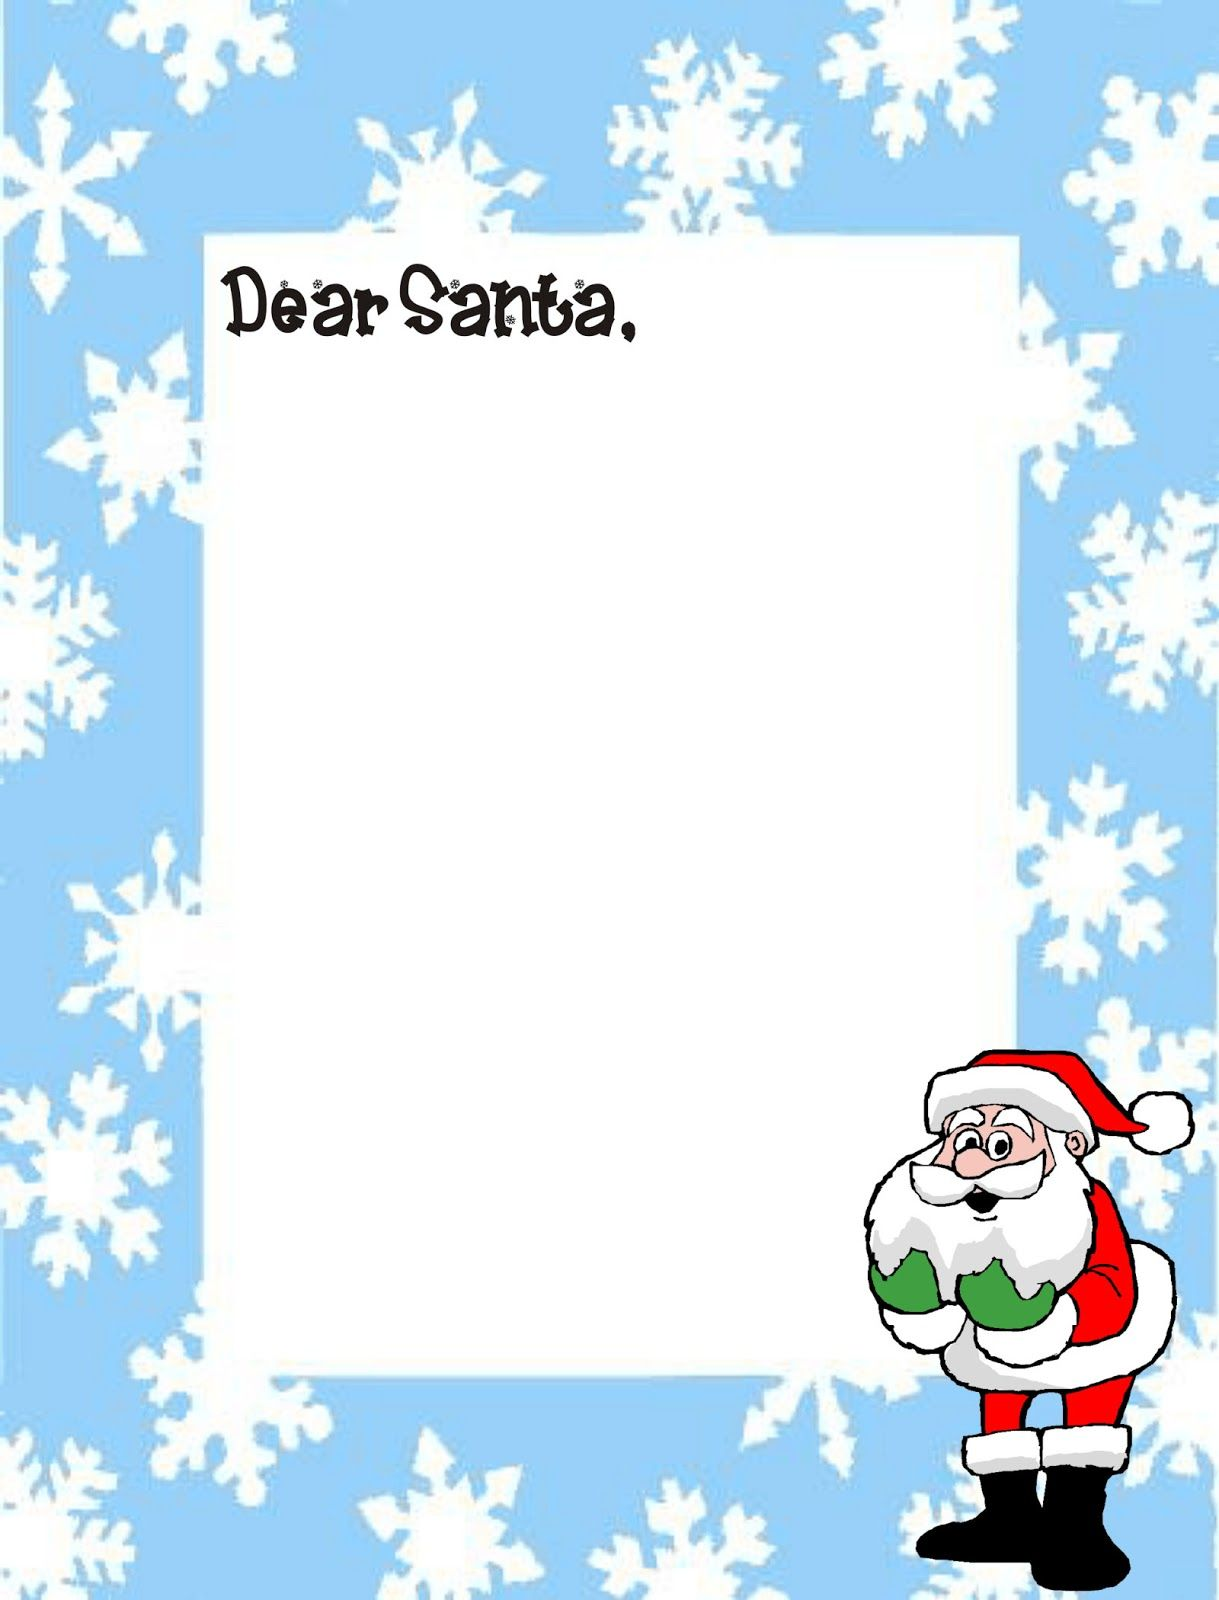 DearSantaLetterTemplateJpg   Printable  Holidays